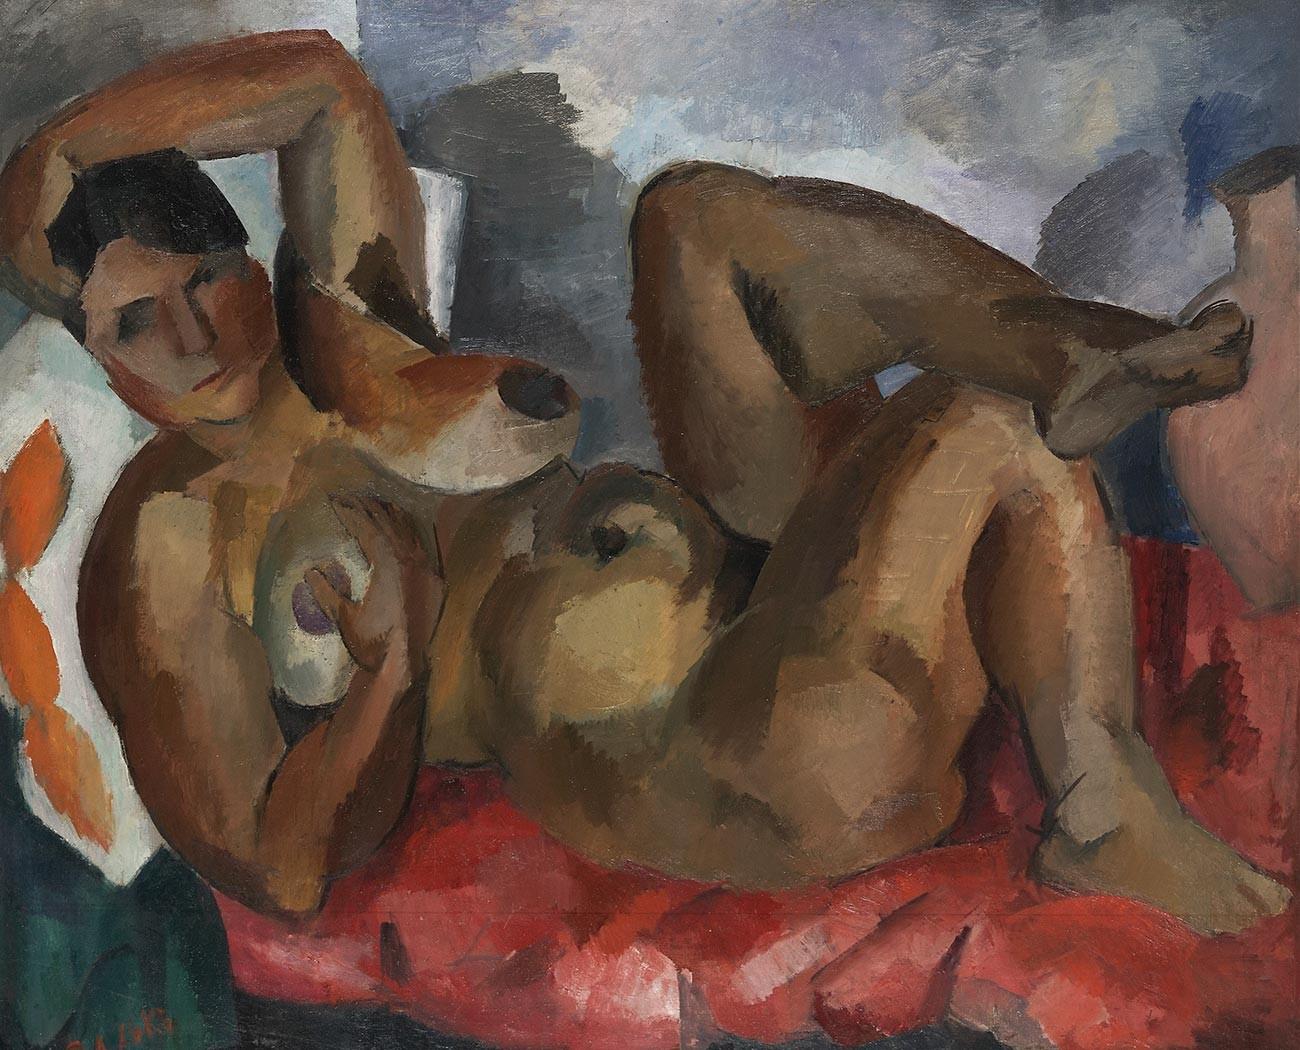 Femme nue. Crimée. 1916